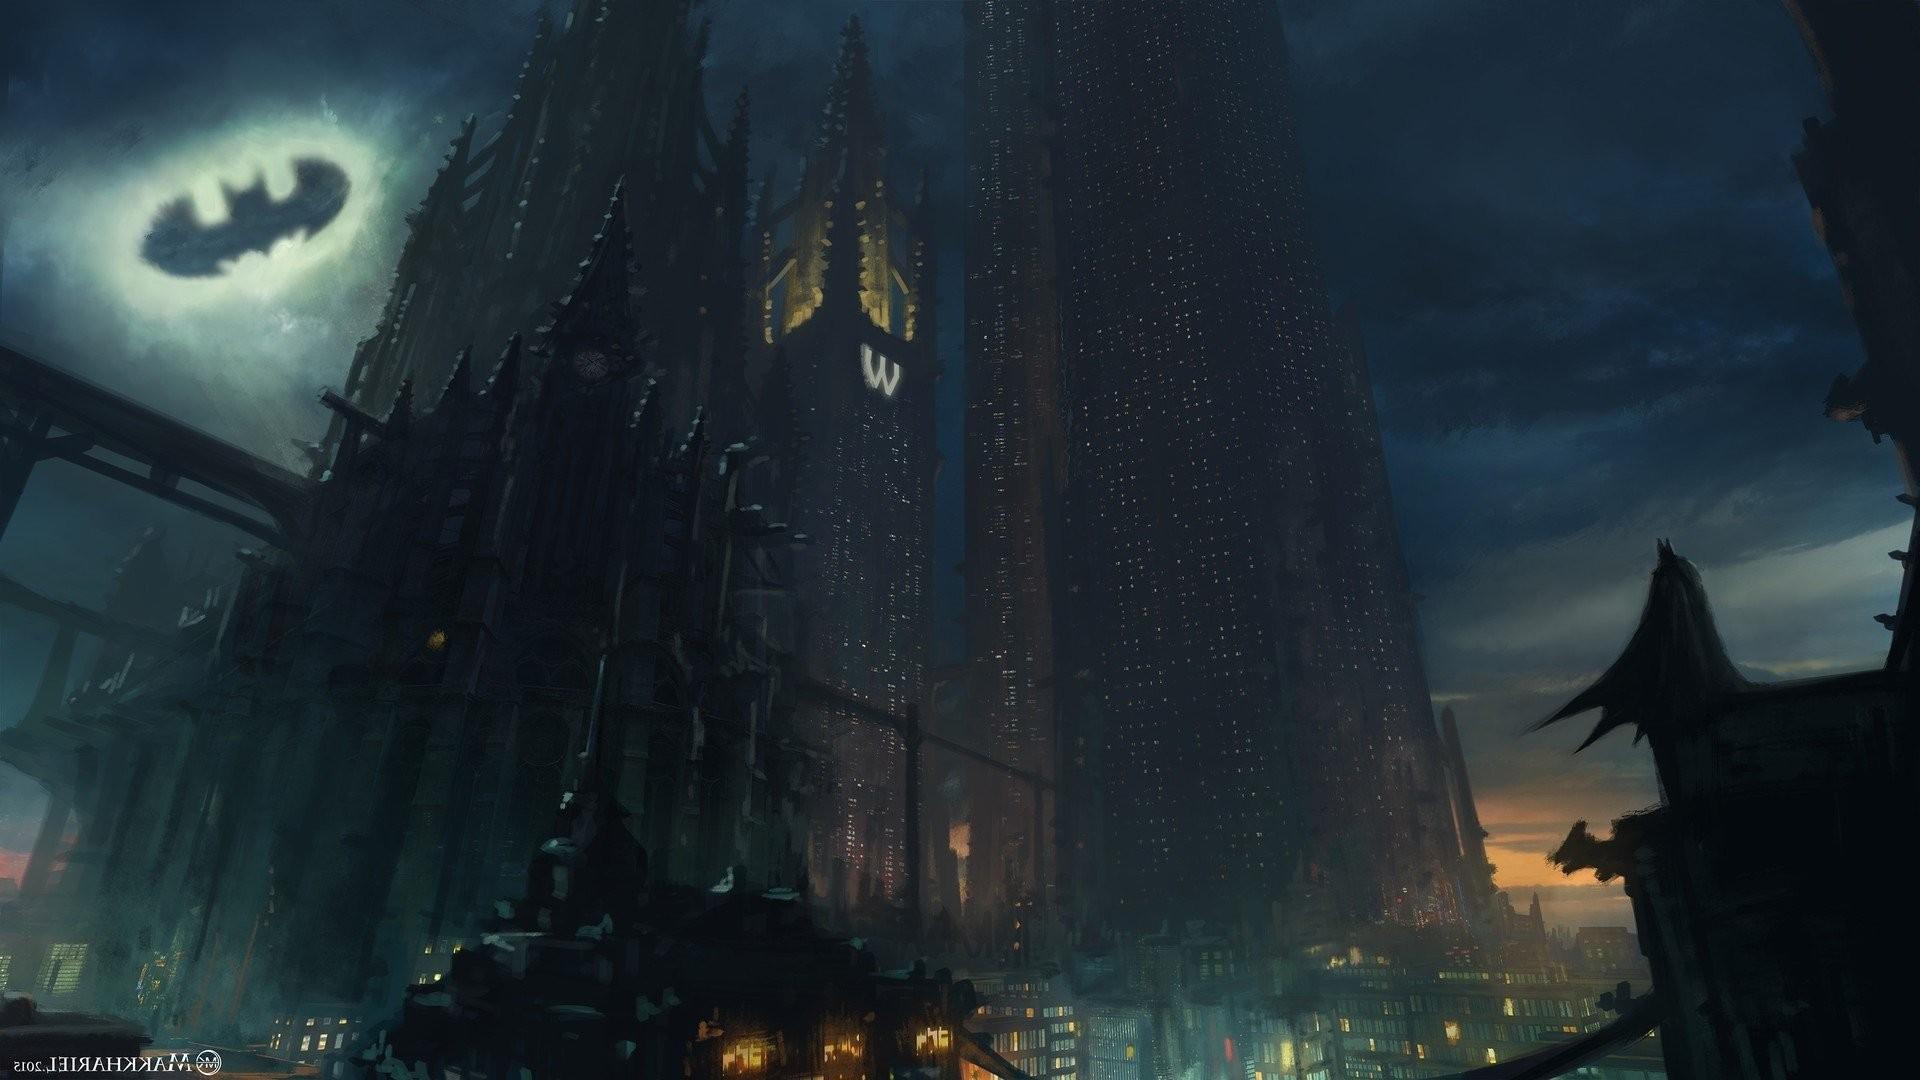 Gotham city background download free amazing full hd - Gotham wallpaper ...